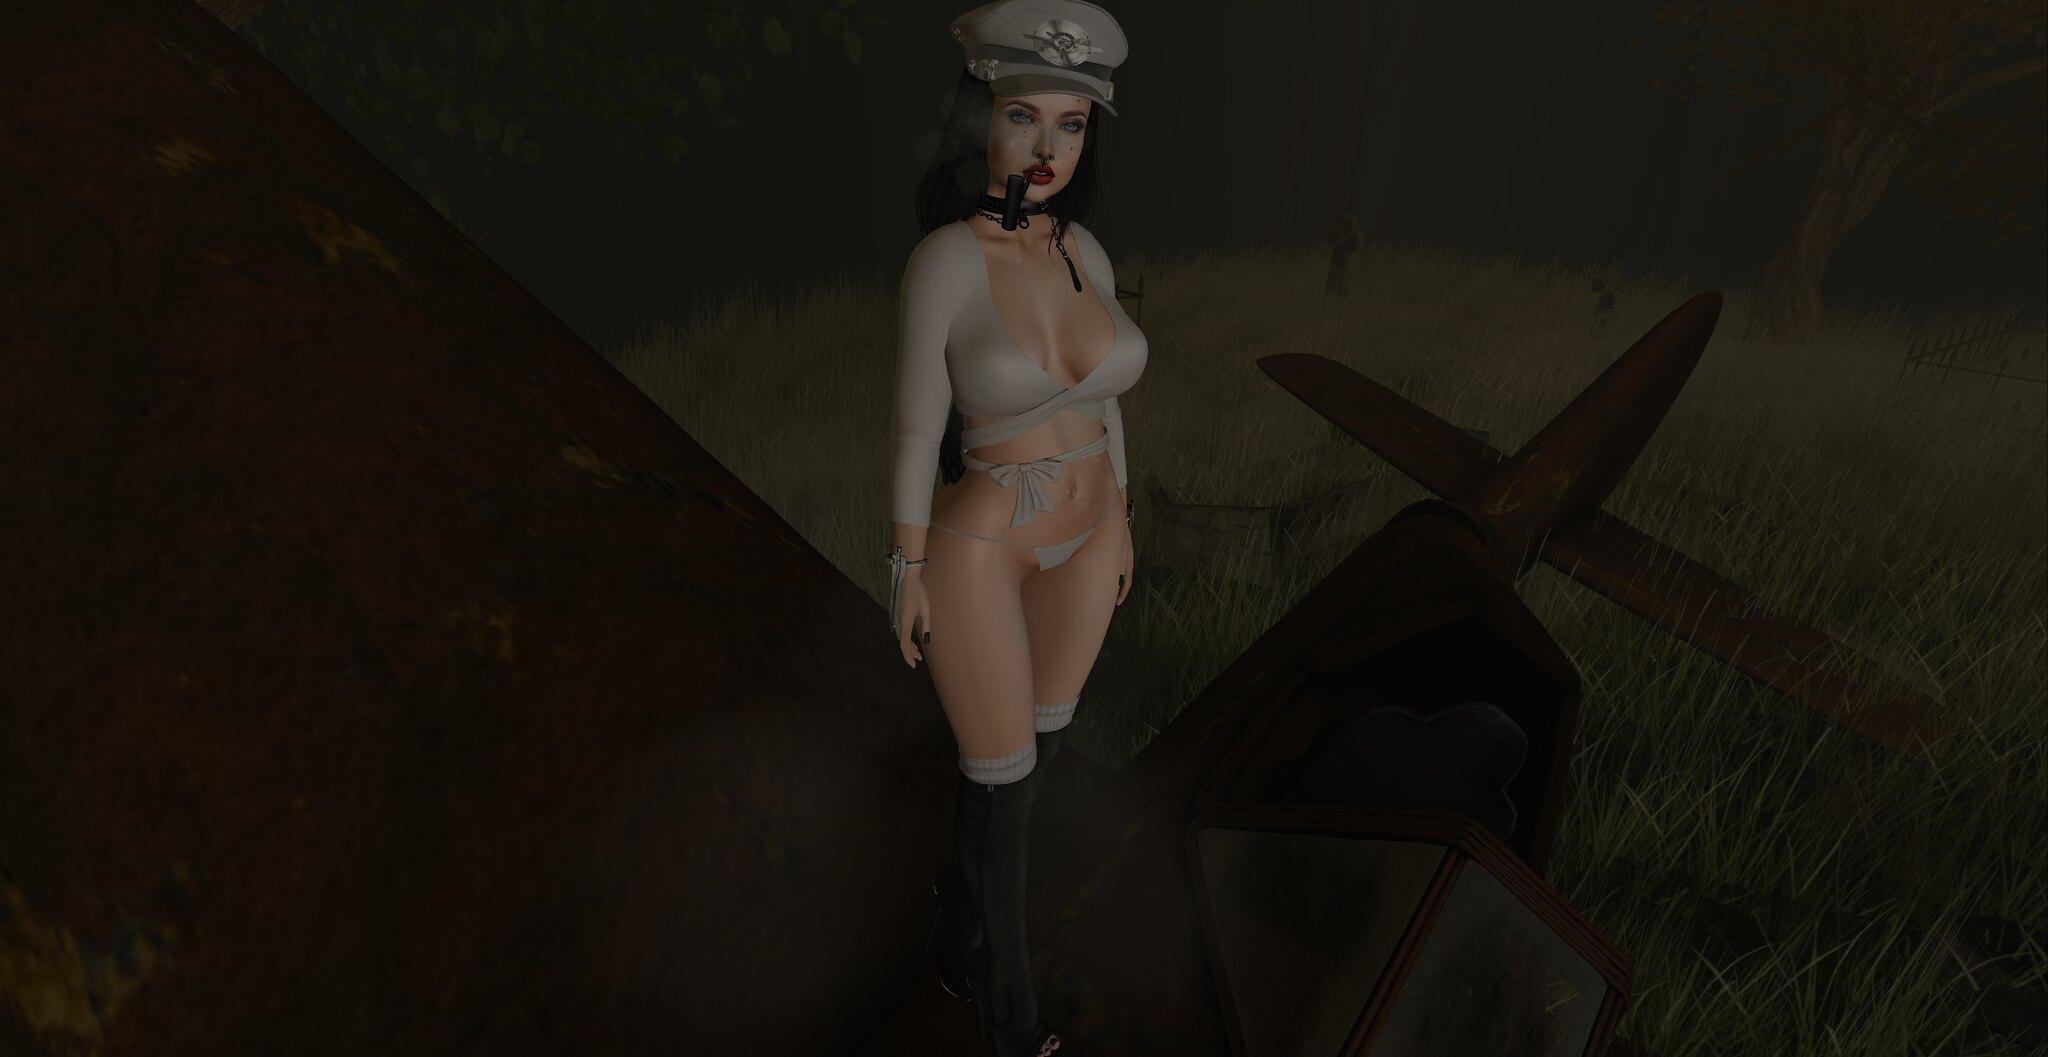 el piloto de mi  destino